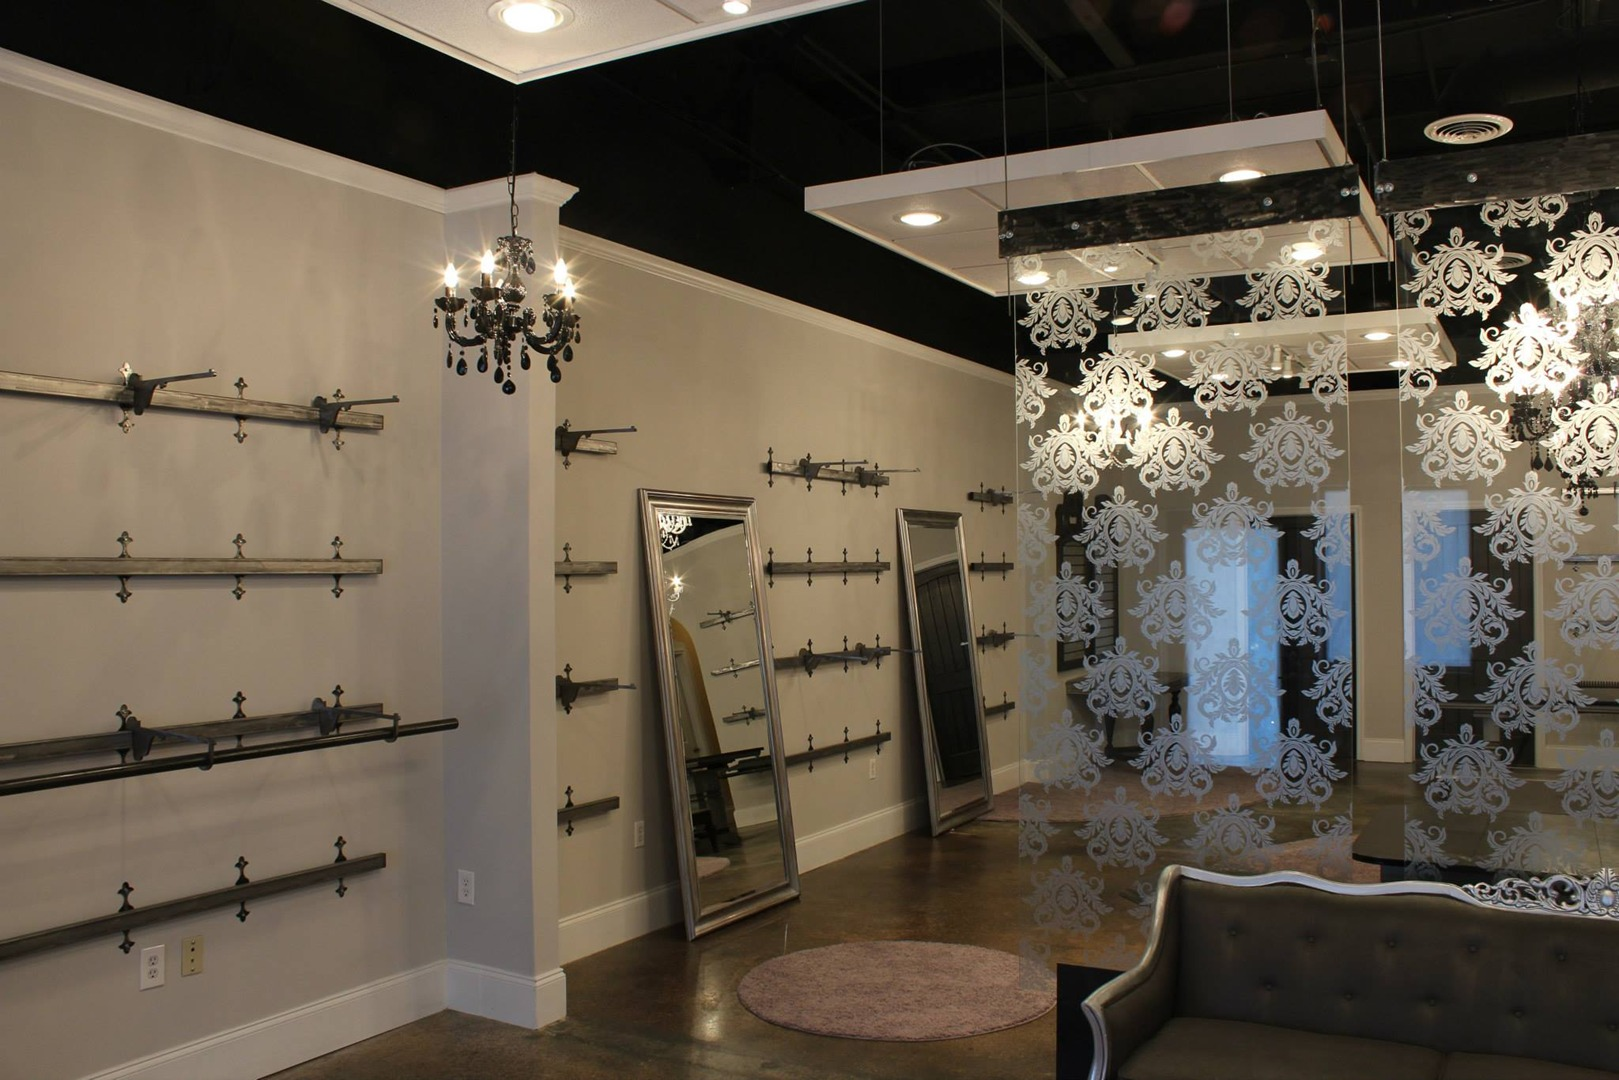 Showroom & Retail Display -